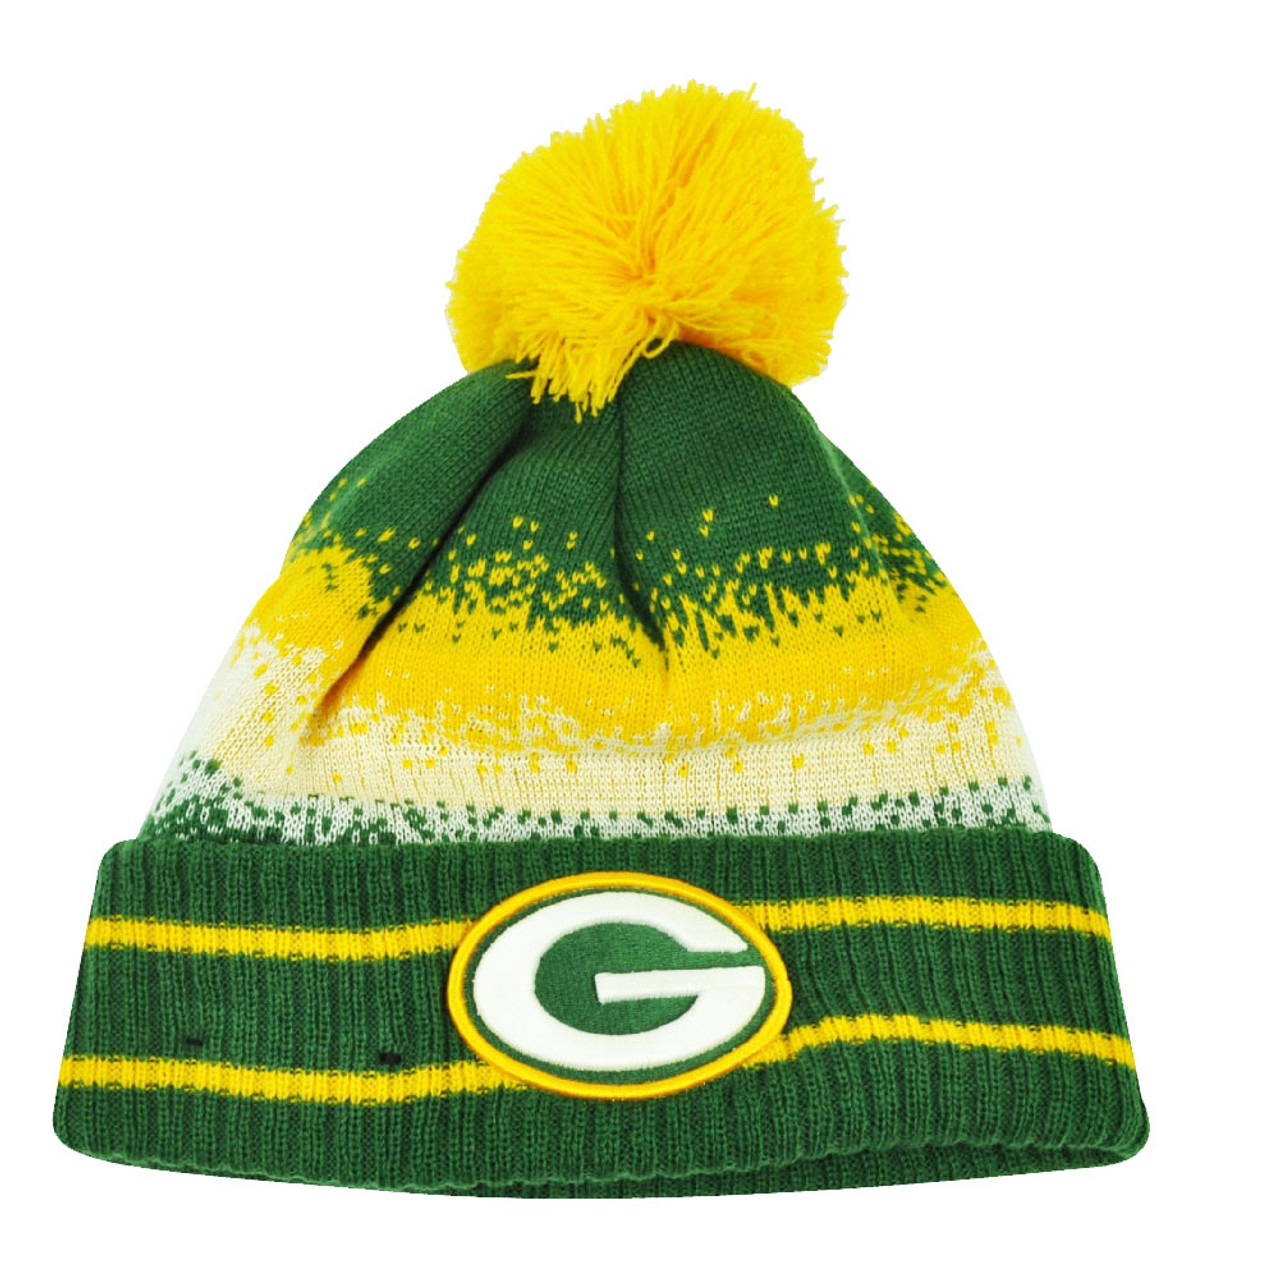 90debc56badeb0 NFL New Era Spec Blend Green Bay Packers Cuffed Pom Pom Knit Beanie Hat  Toque - Cap Store Online.com